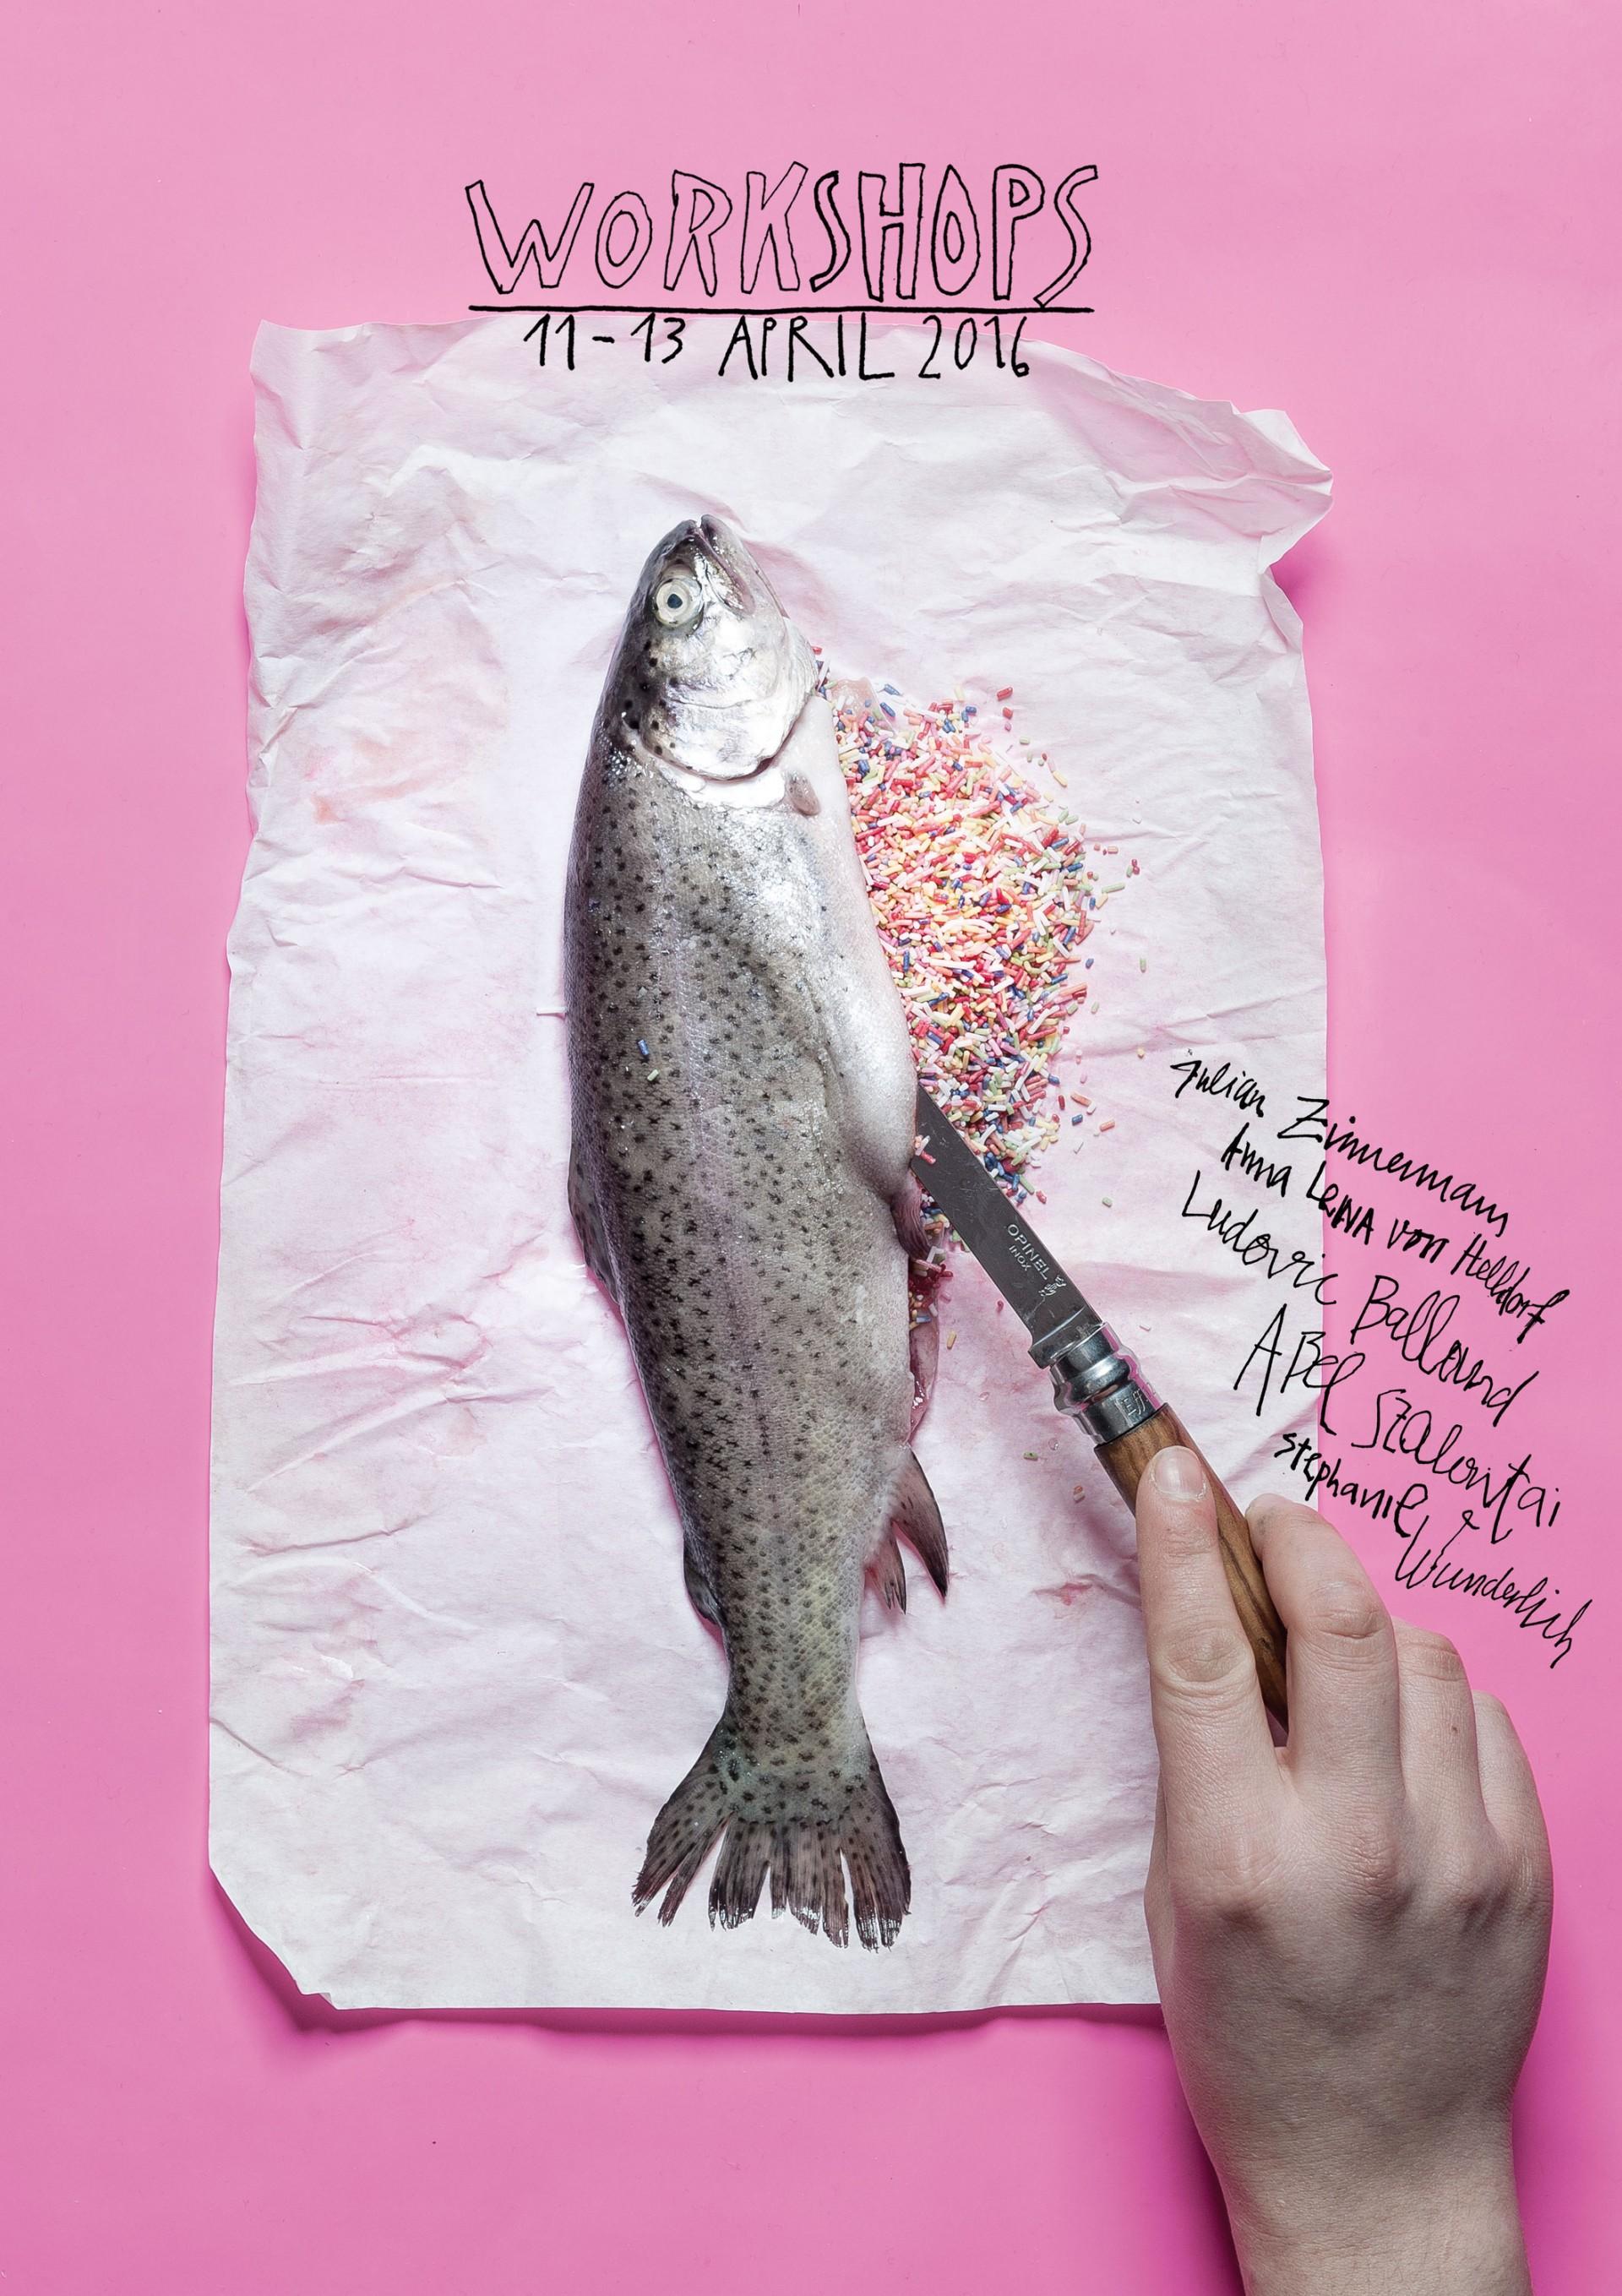 Anna Kiosse Poster I